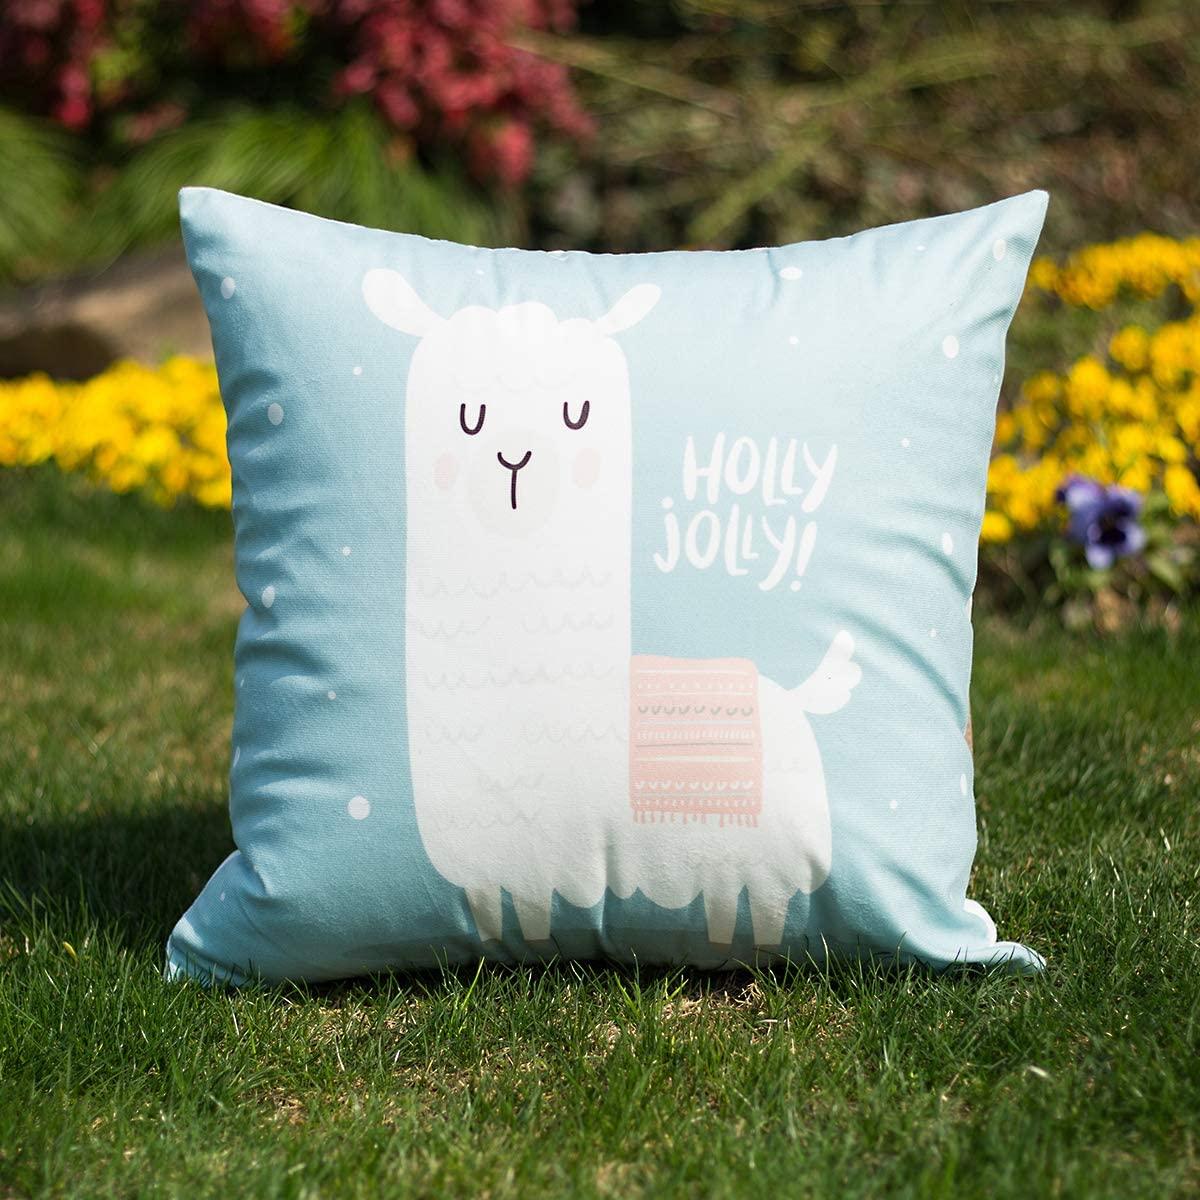 Fancyoung Decorative Alpaca Throw Pillow Covers Mascot Set of 2 Cute Llama Pillowcase Home Decor Cushion Cover Pillow Case for Sofa 18